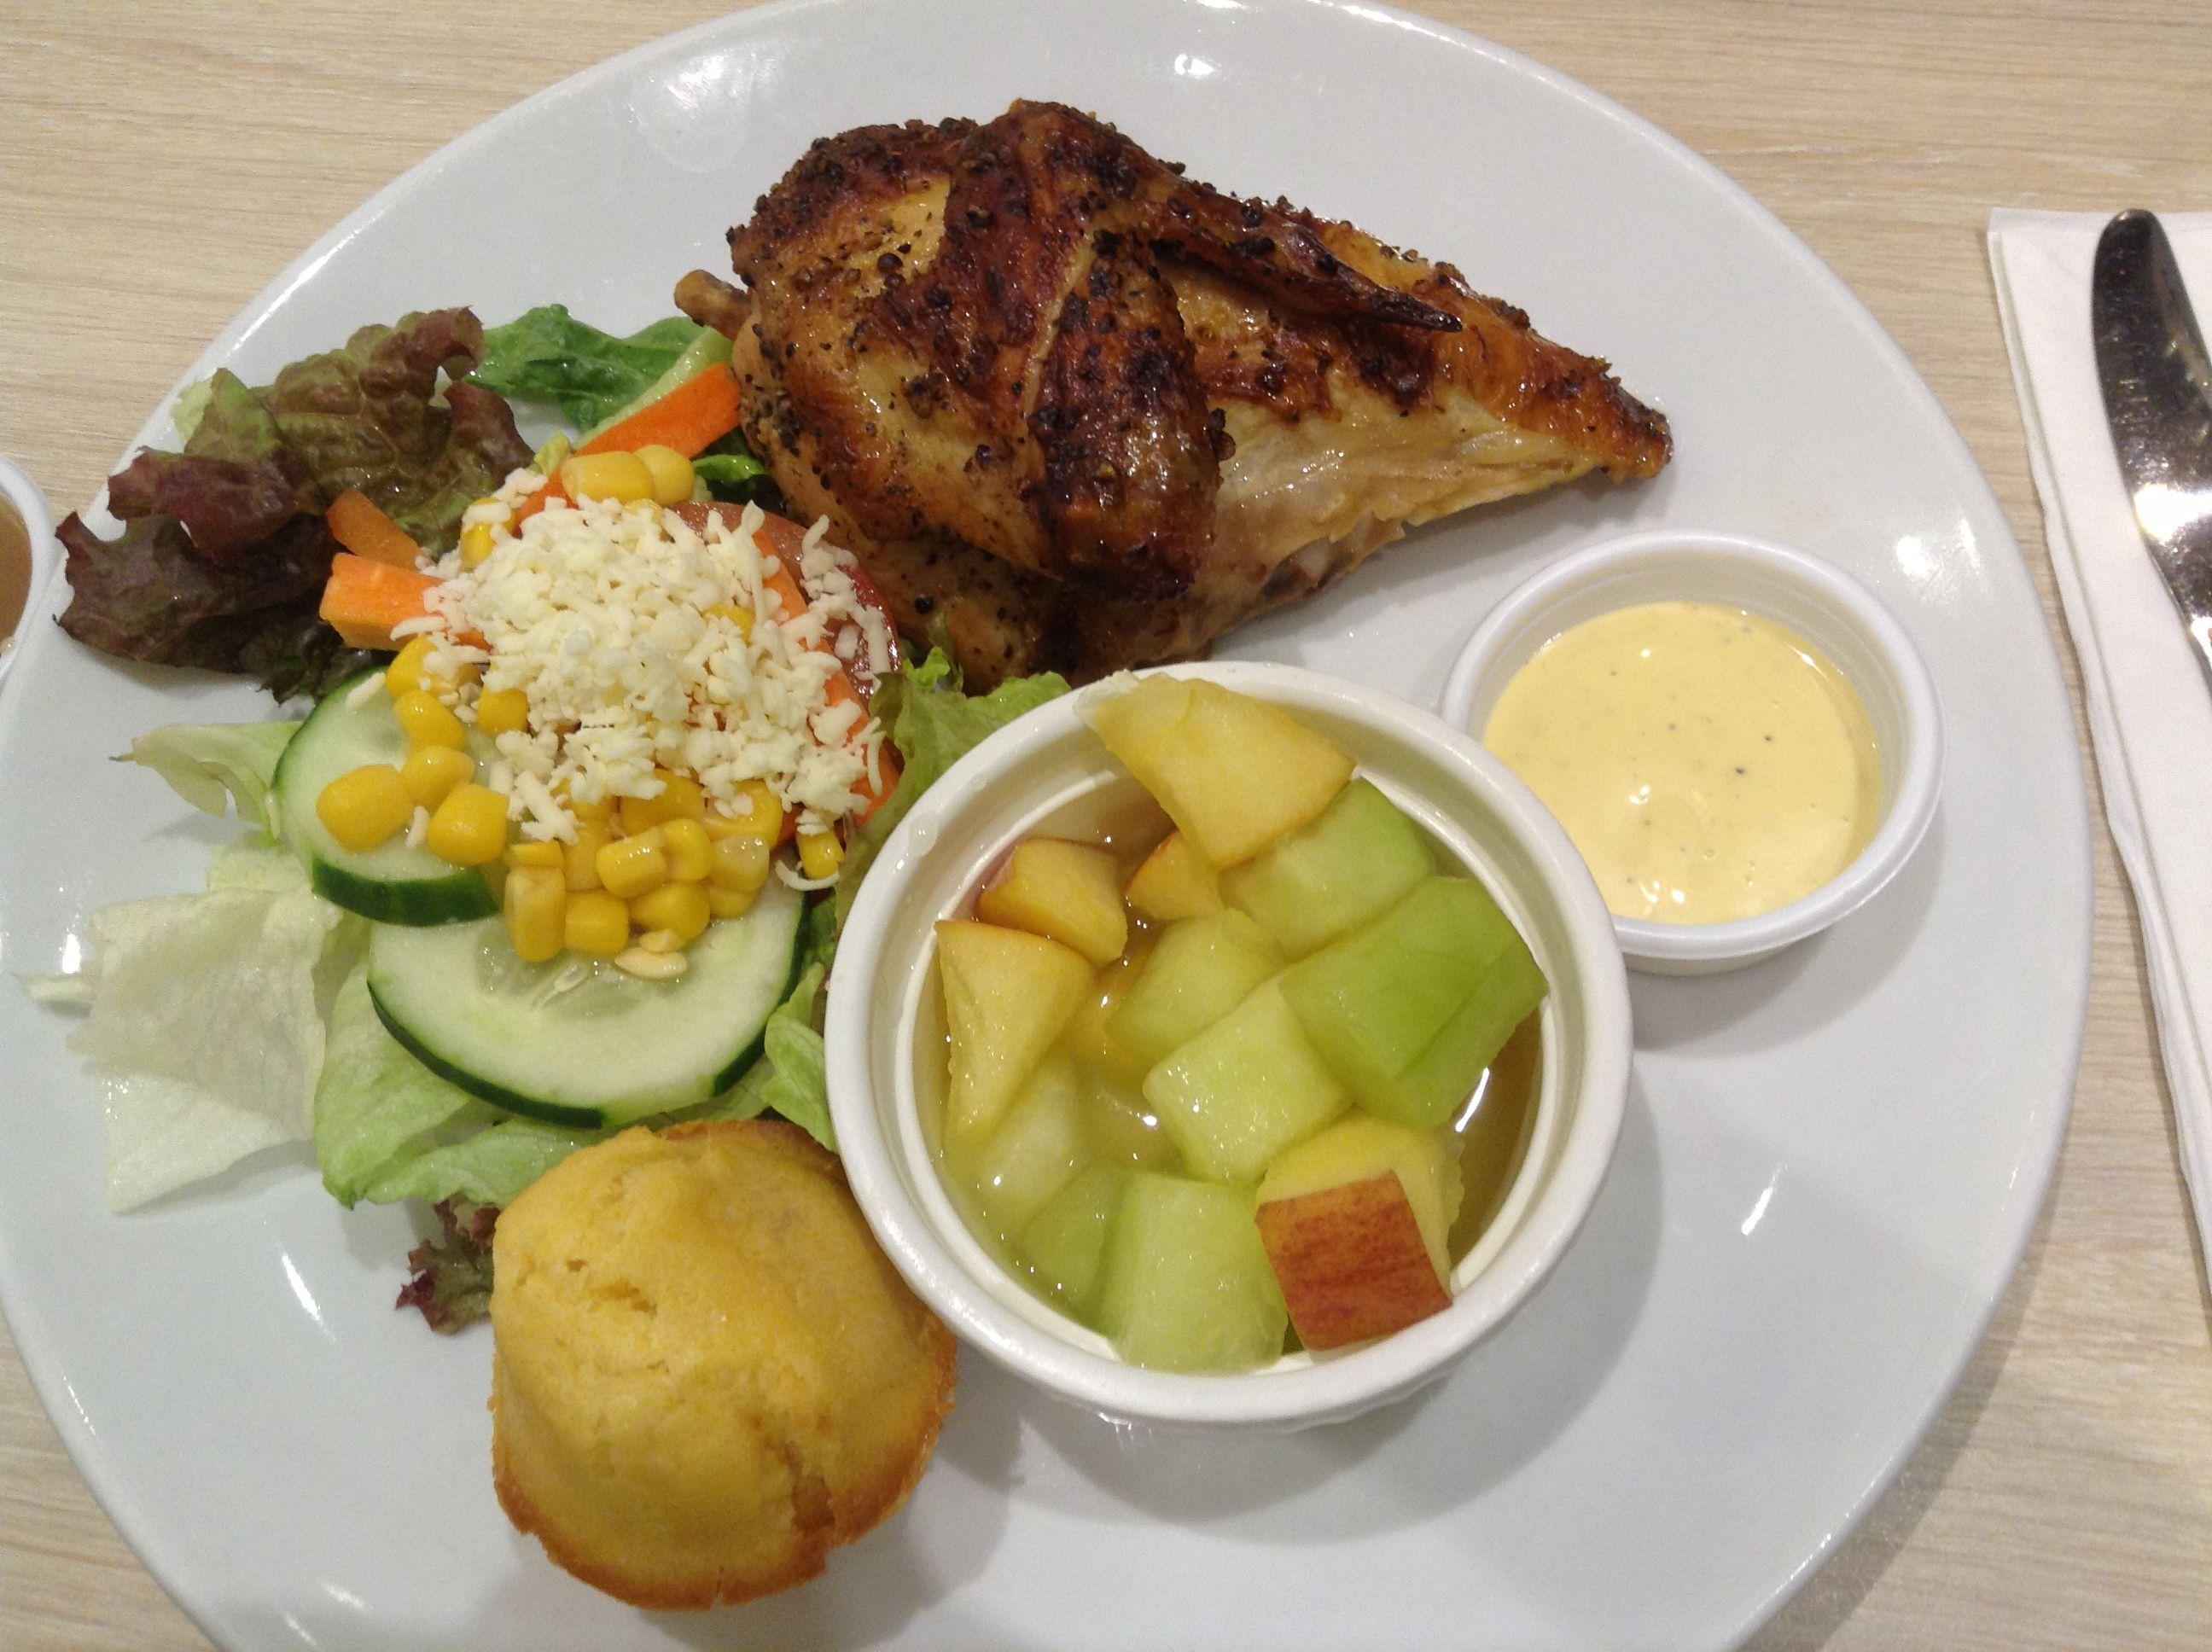 Philippines: Kenny Rogers Chicken | Travel food, Food, Pork